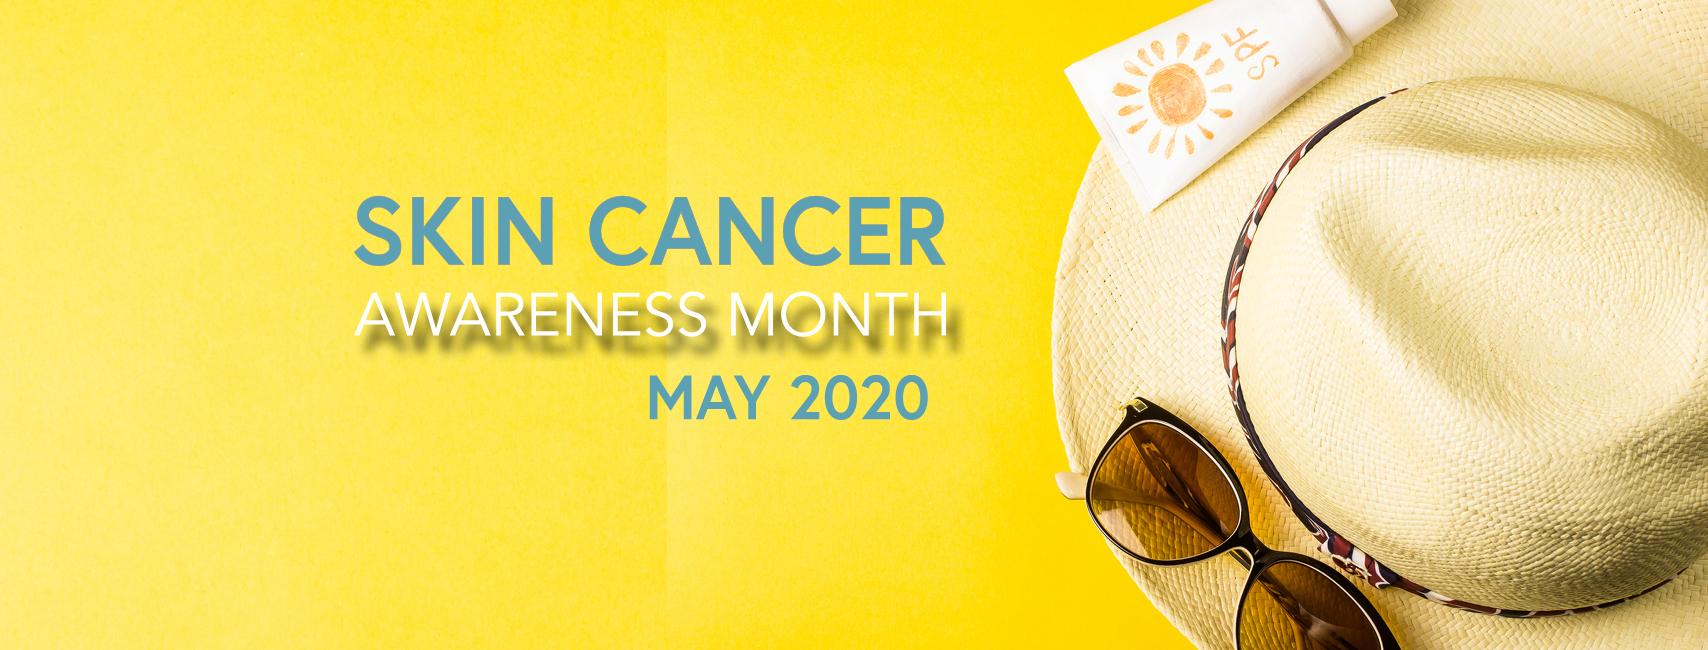 Skin Cancer Awareness Month The Skin Cancer Foundation